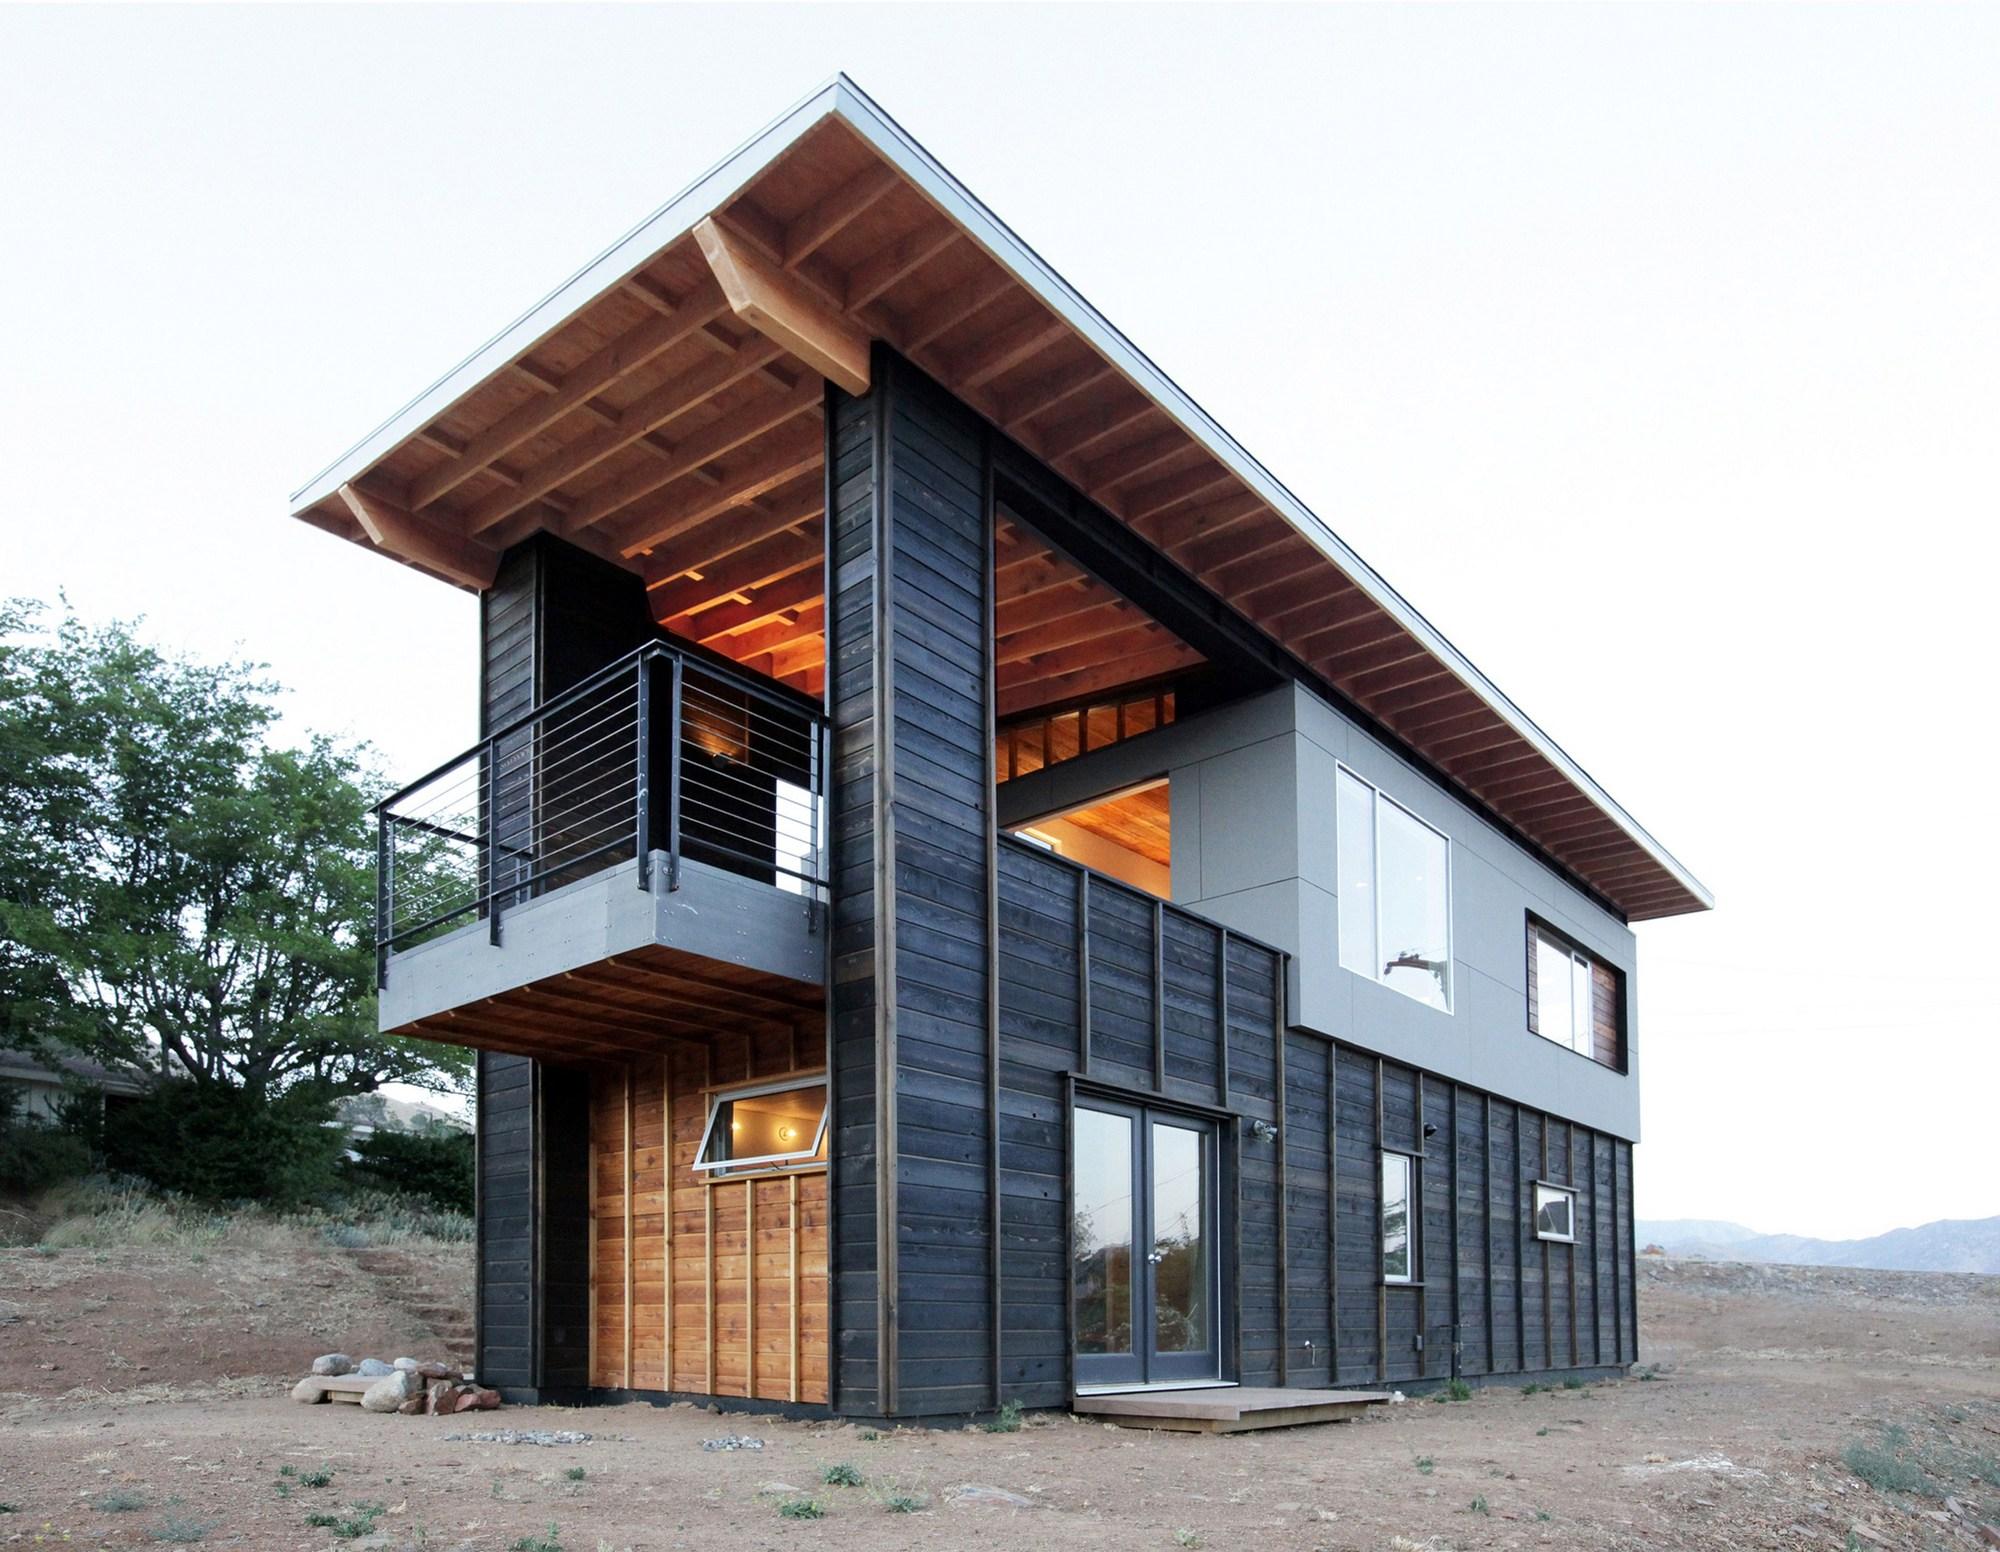 510 Cabin / Hunter Leggitt Studio | ArchDaily